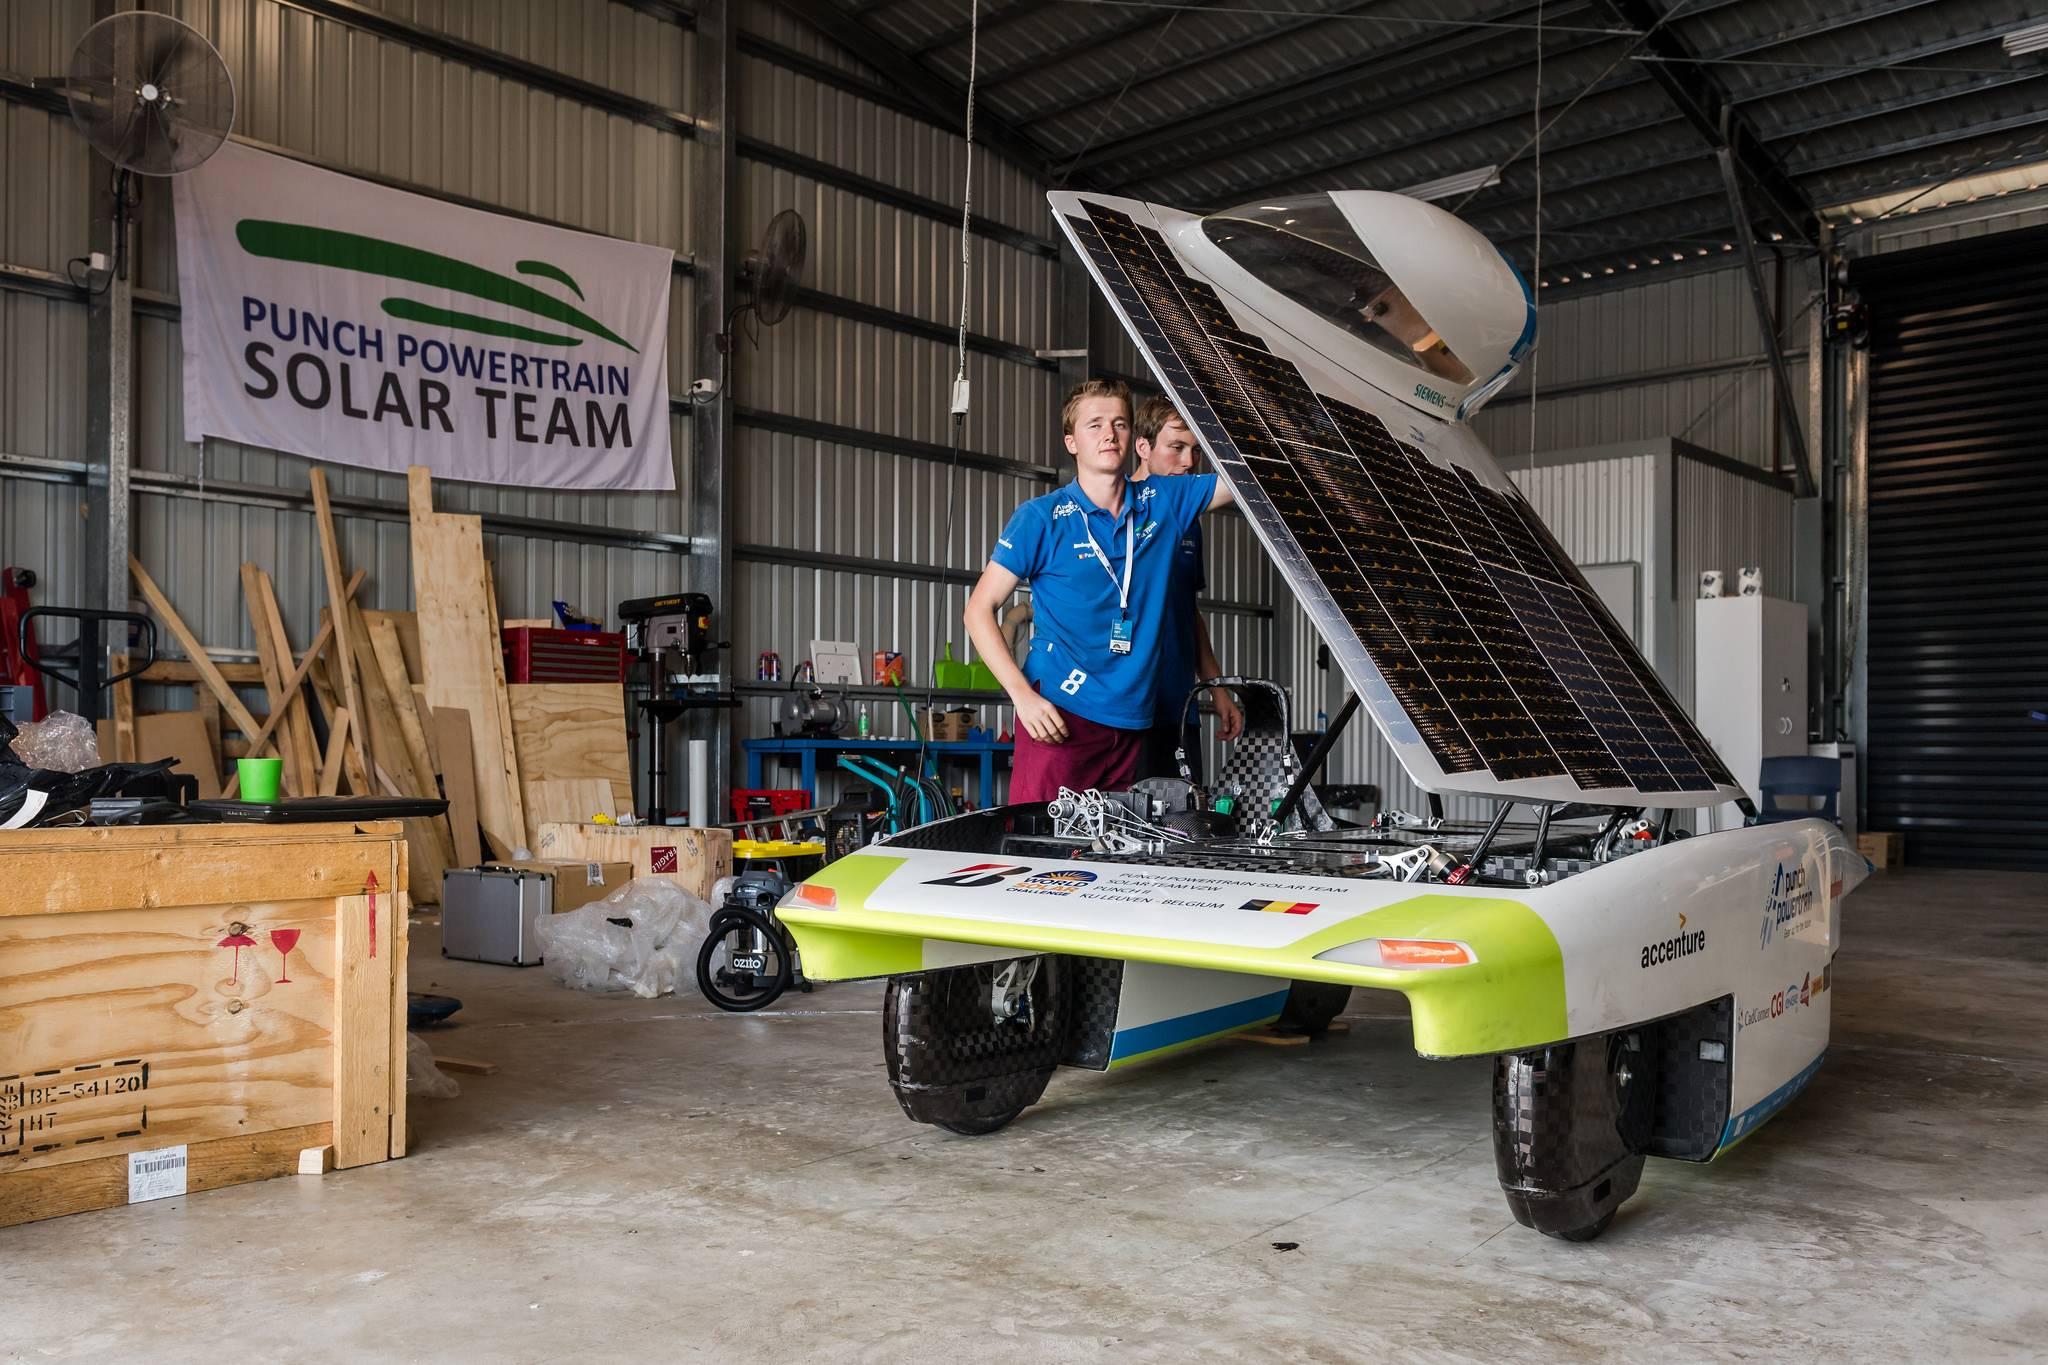 DHL auto solar